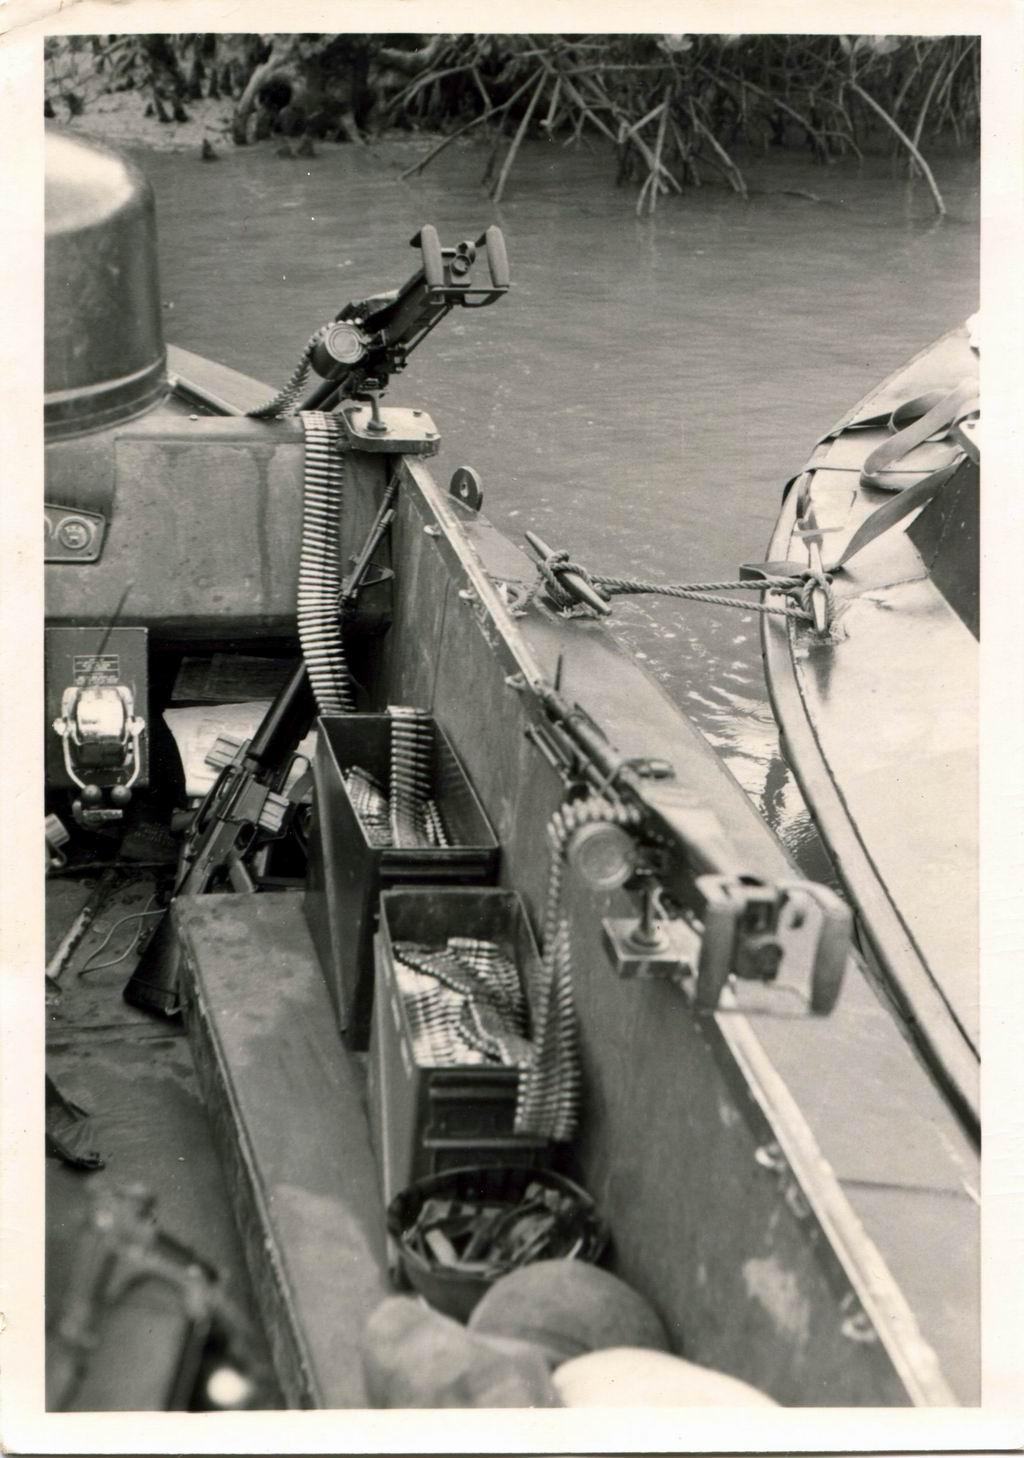 Patrol Air Cushion Vehicle (PACV) et Patrol Boat River (PBR) M60%20GPMG%20R5%204